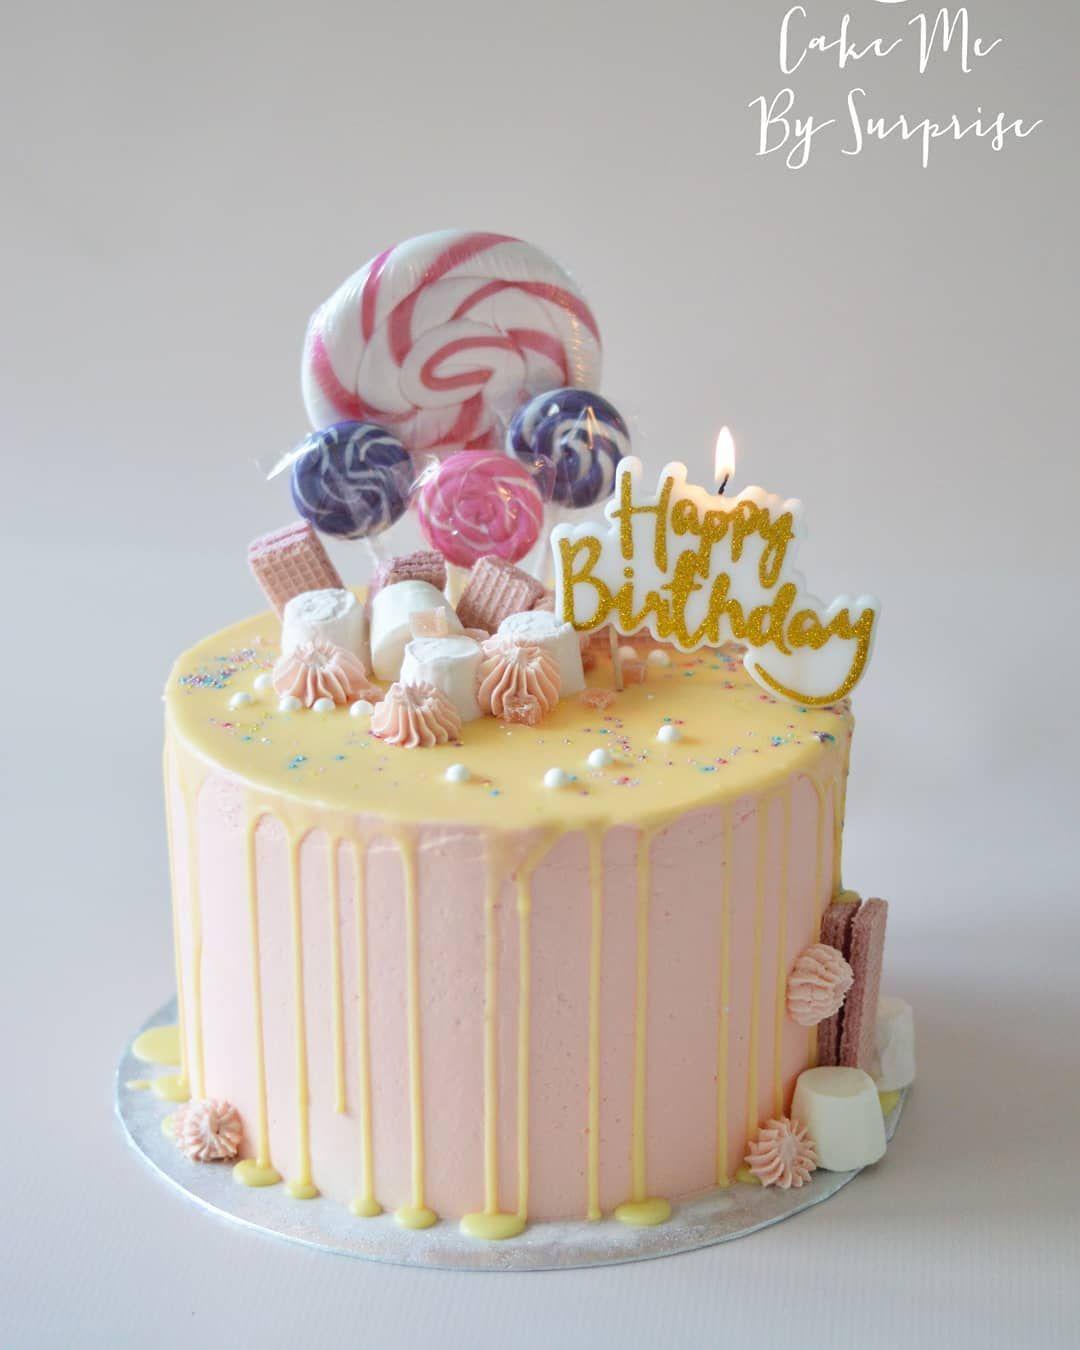 Drip Style Birthday Cake Happy Birthday Dripcake Birthdaycake Pinkcake Cool Birthday Cakes Birthday Cake Decorating Gluten Free Birthday Cake